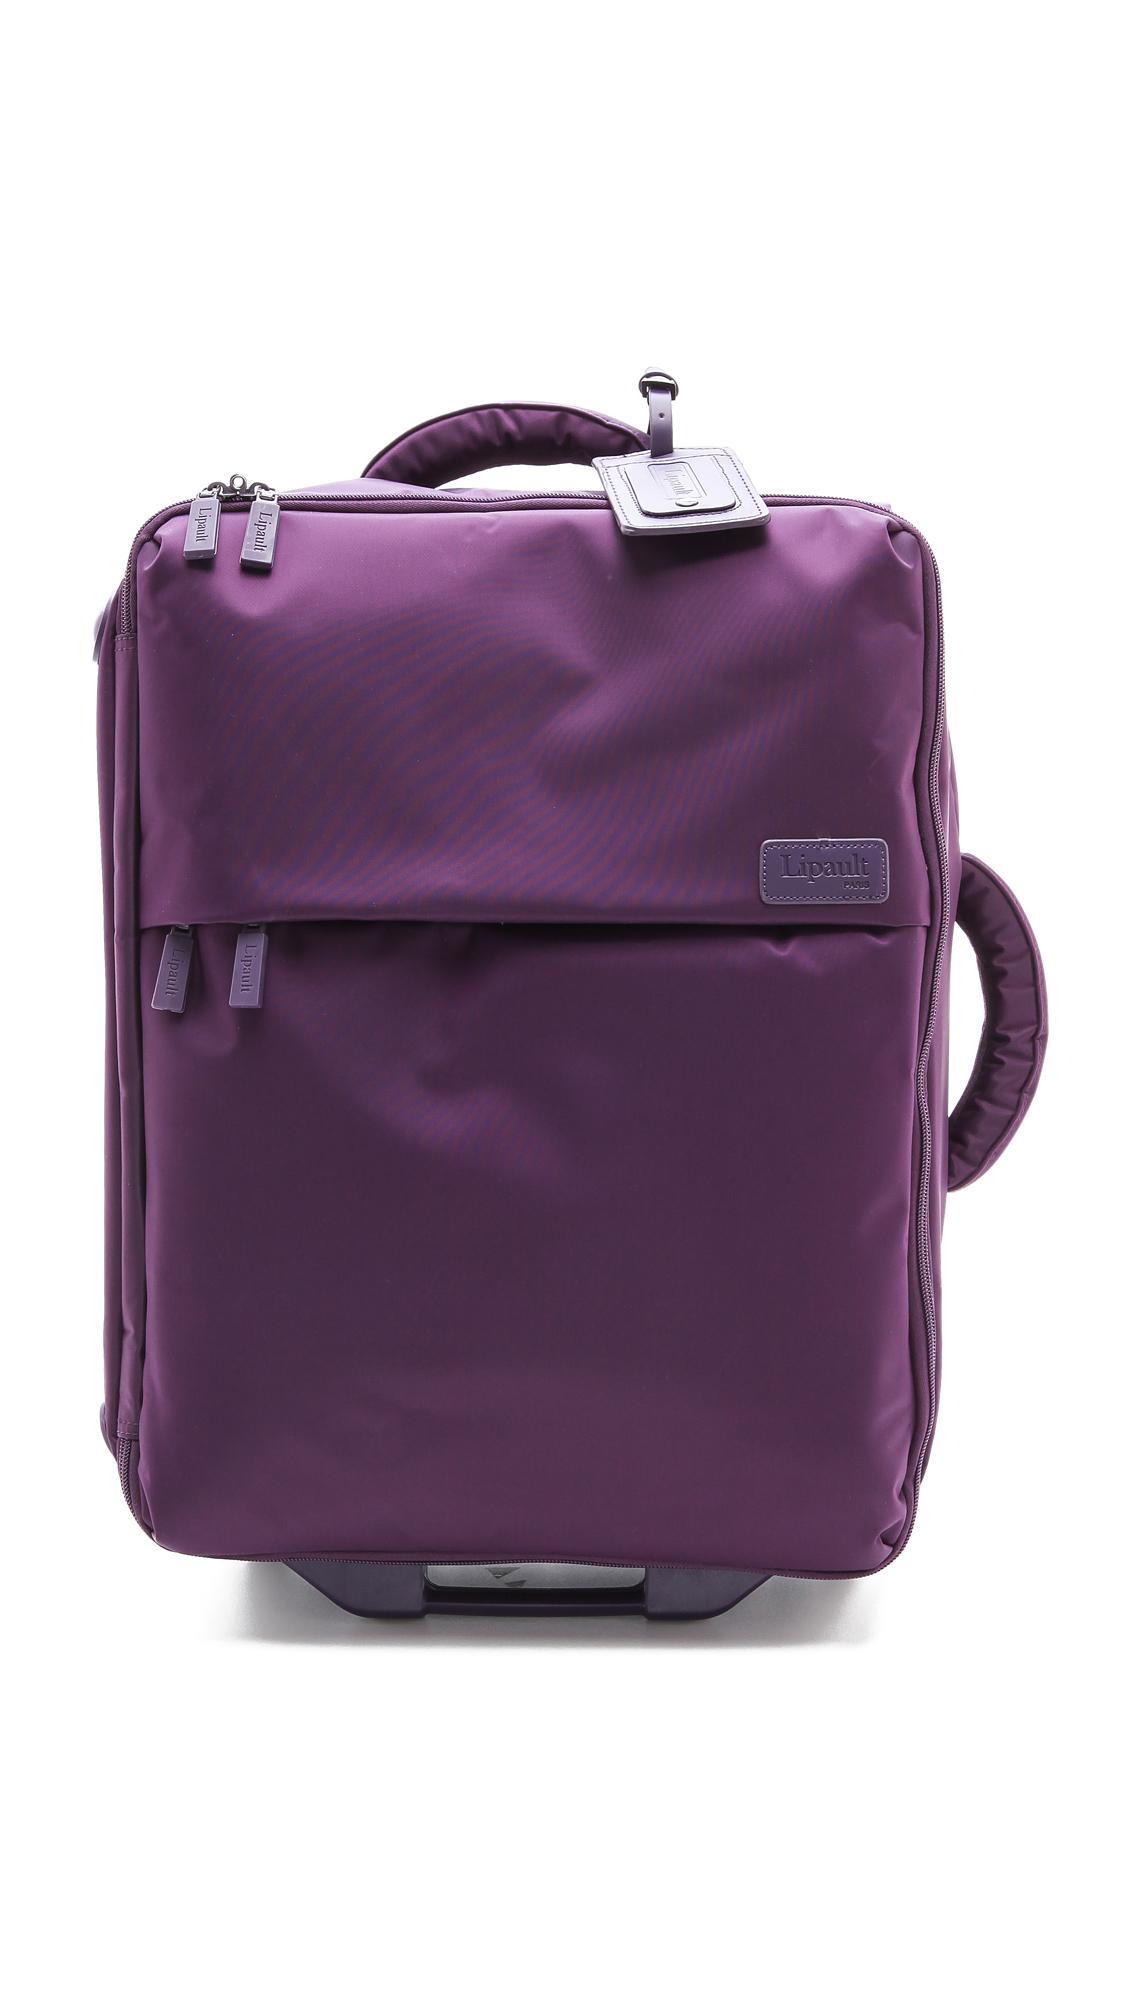 lipault foldable 22 wheeled carry on bag teal in purple. Black Bedroom Furniture Sets. Home Design Ideas